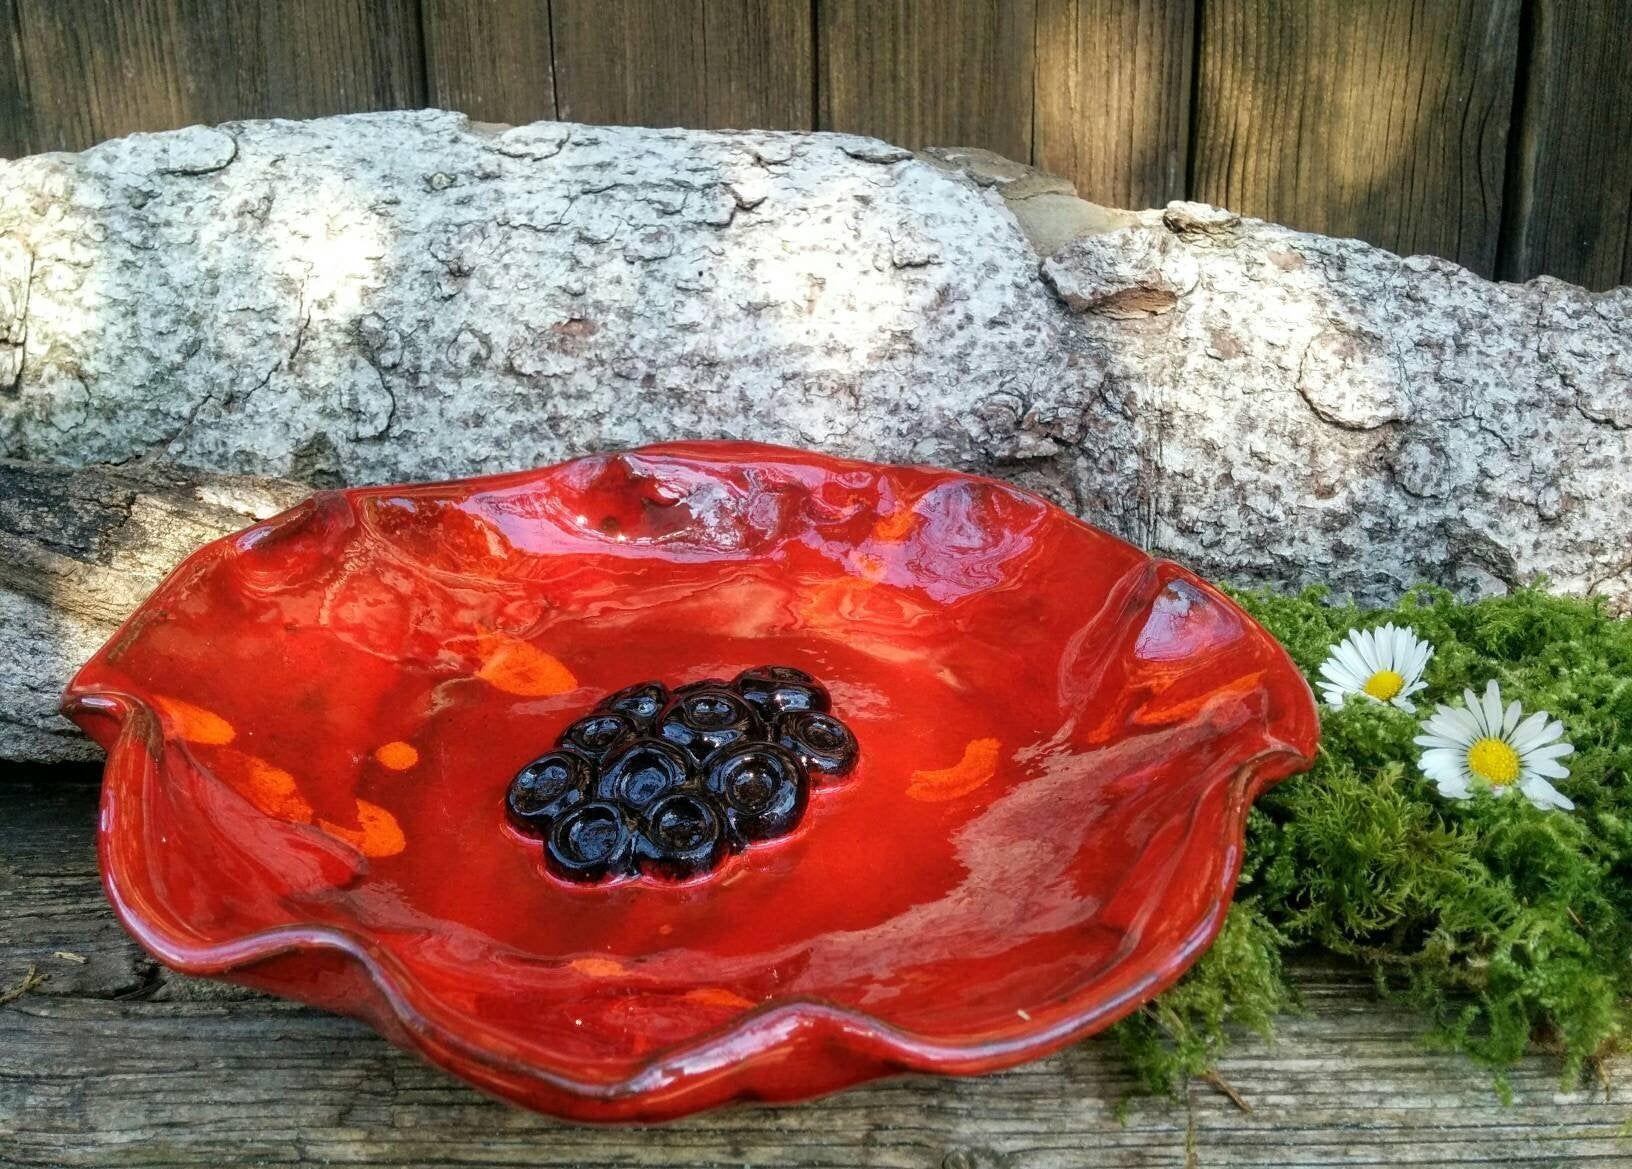 Keramik Schale Mohnblume Getopfert In 2020 Bowl Serving Bowls Ceramics